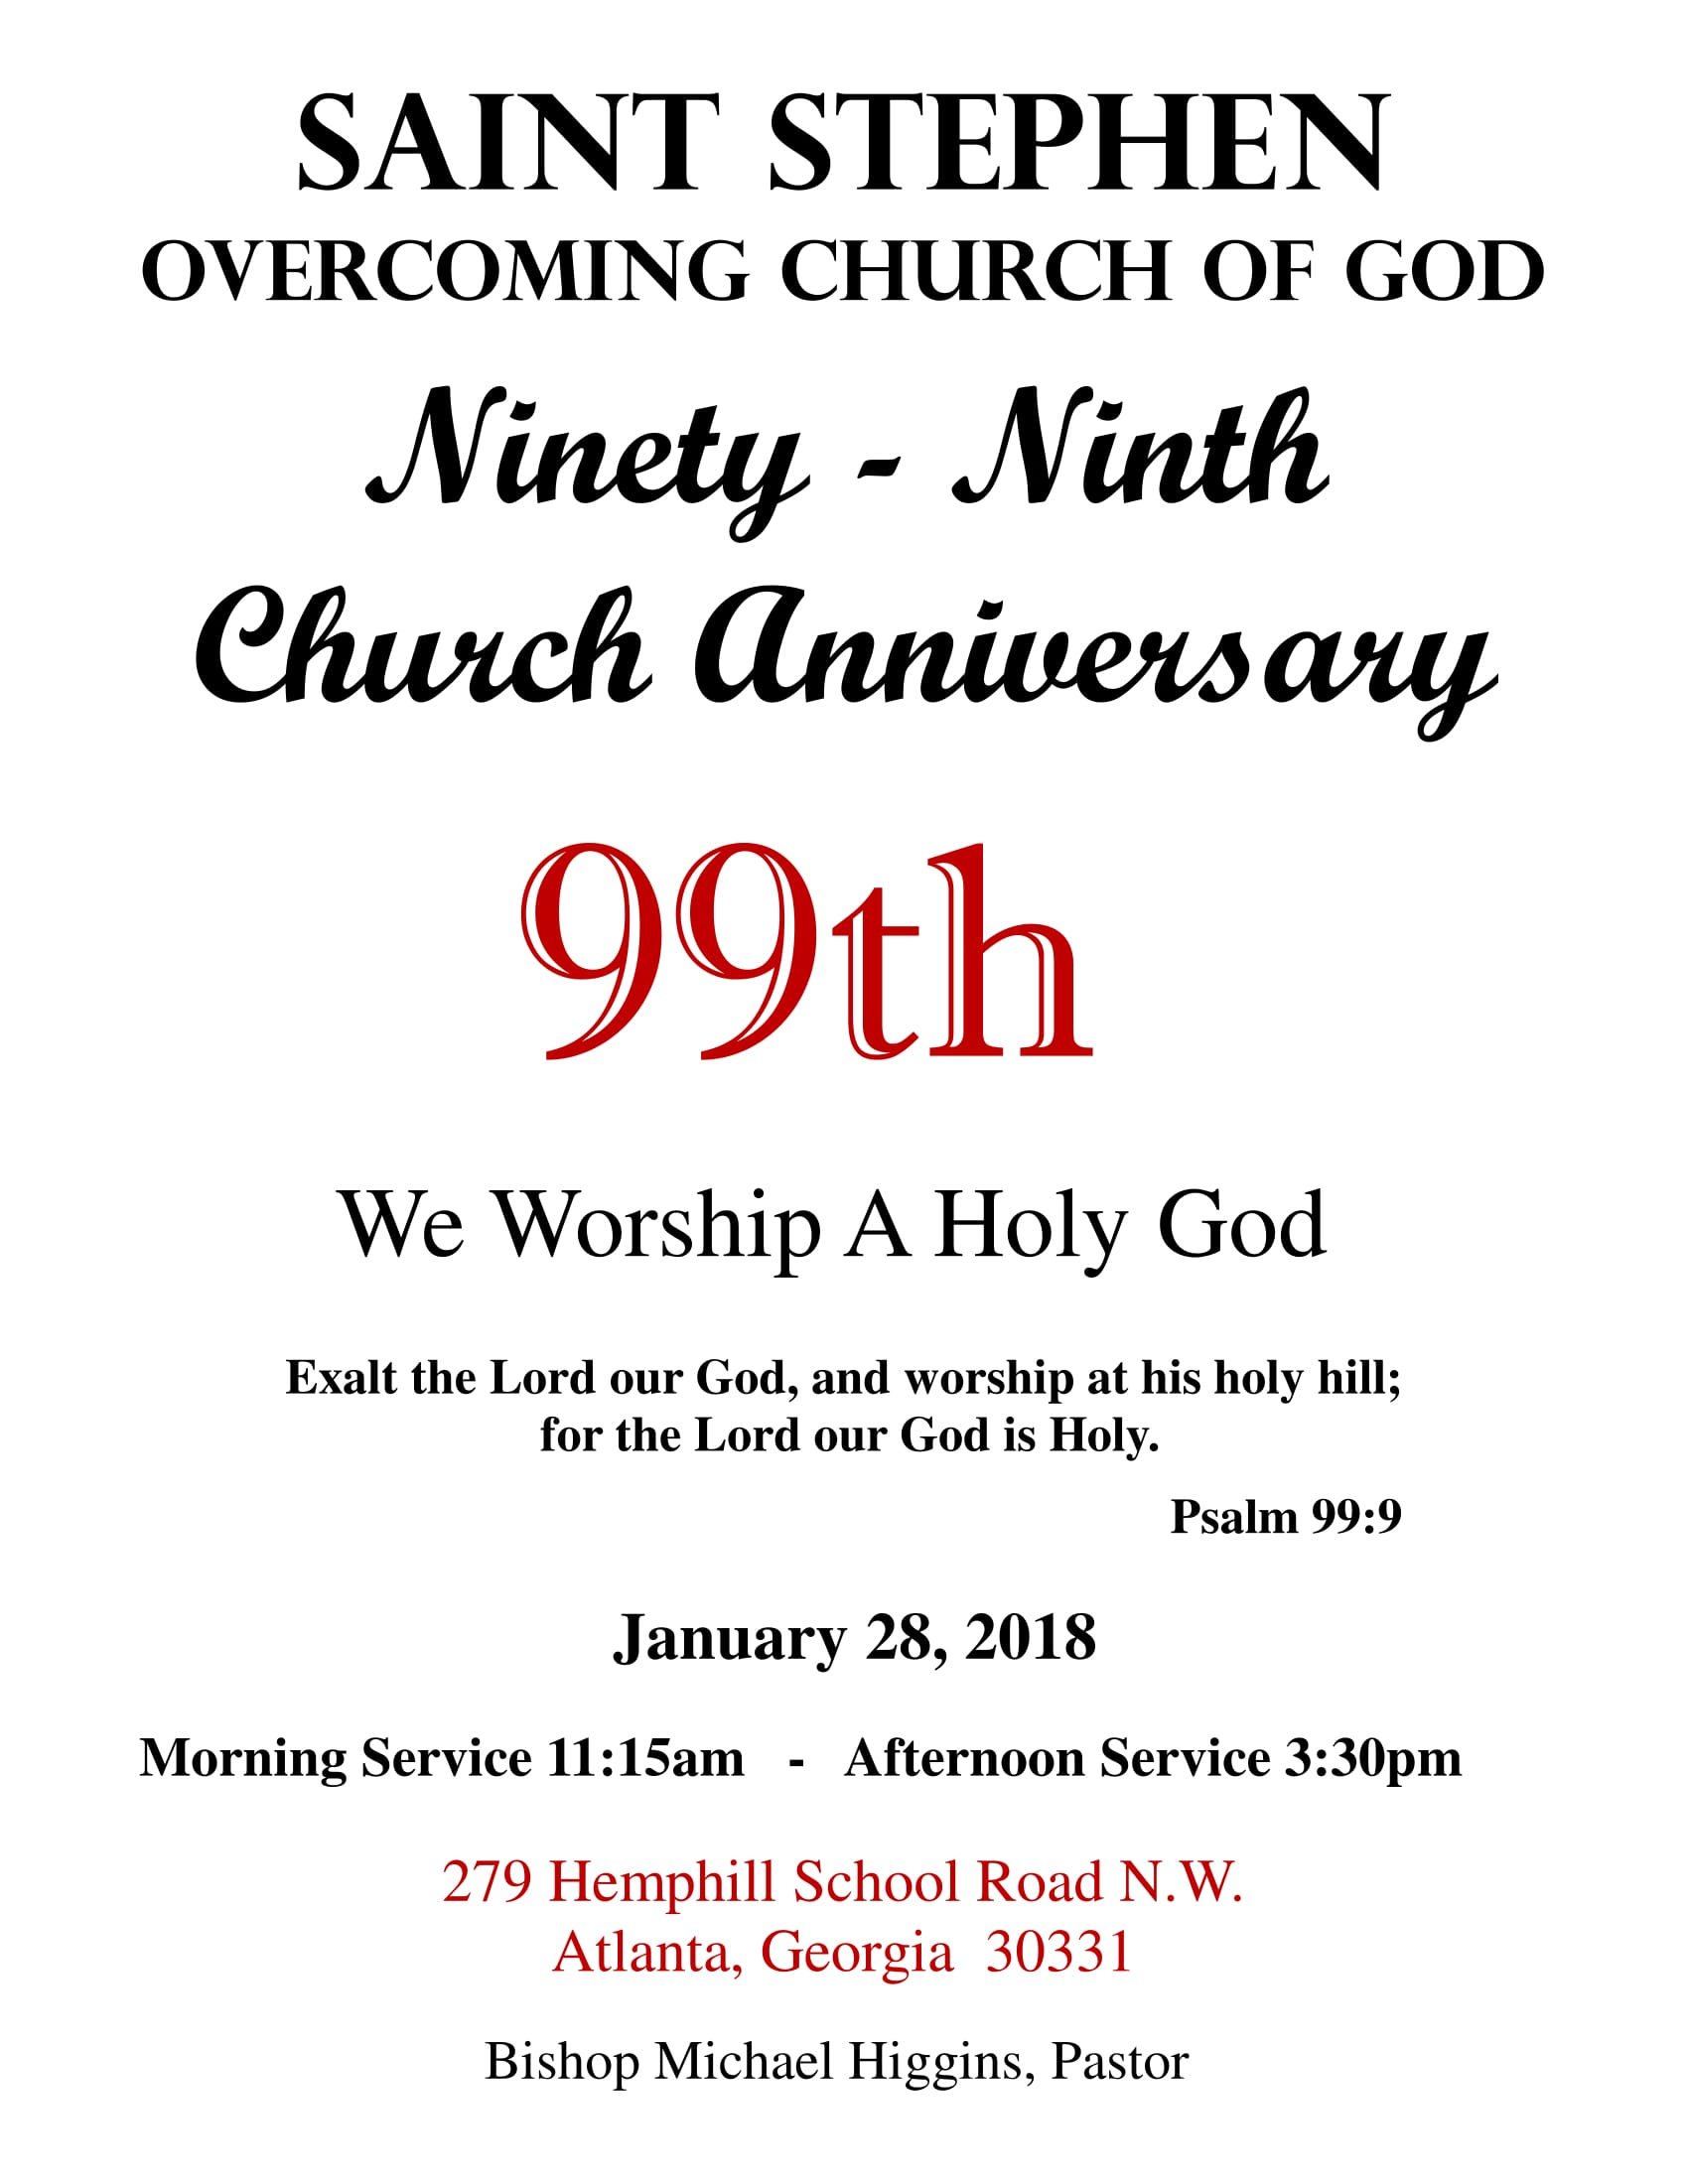 99th Church Anniversary Celebration